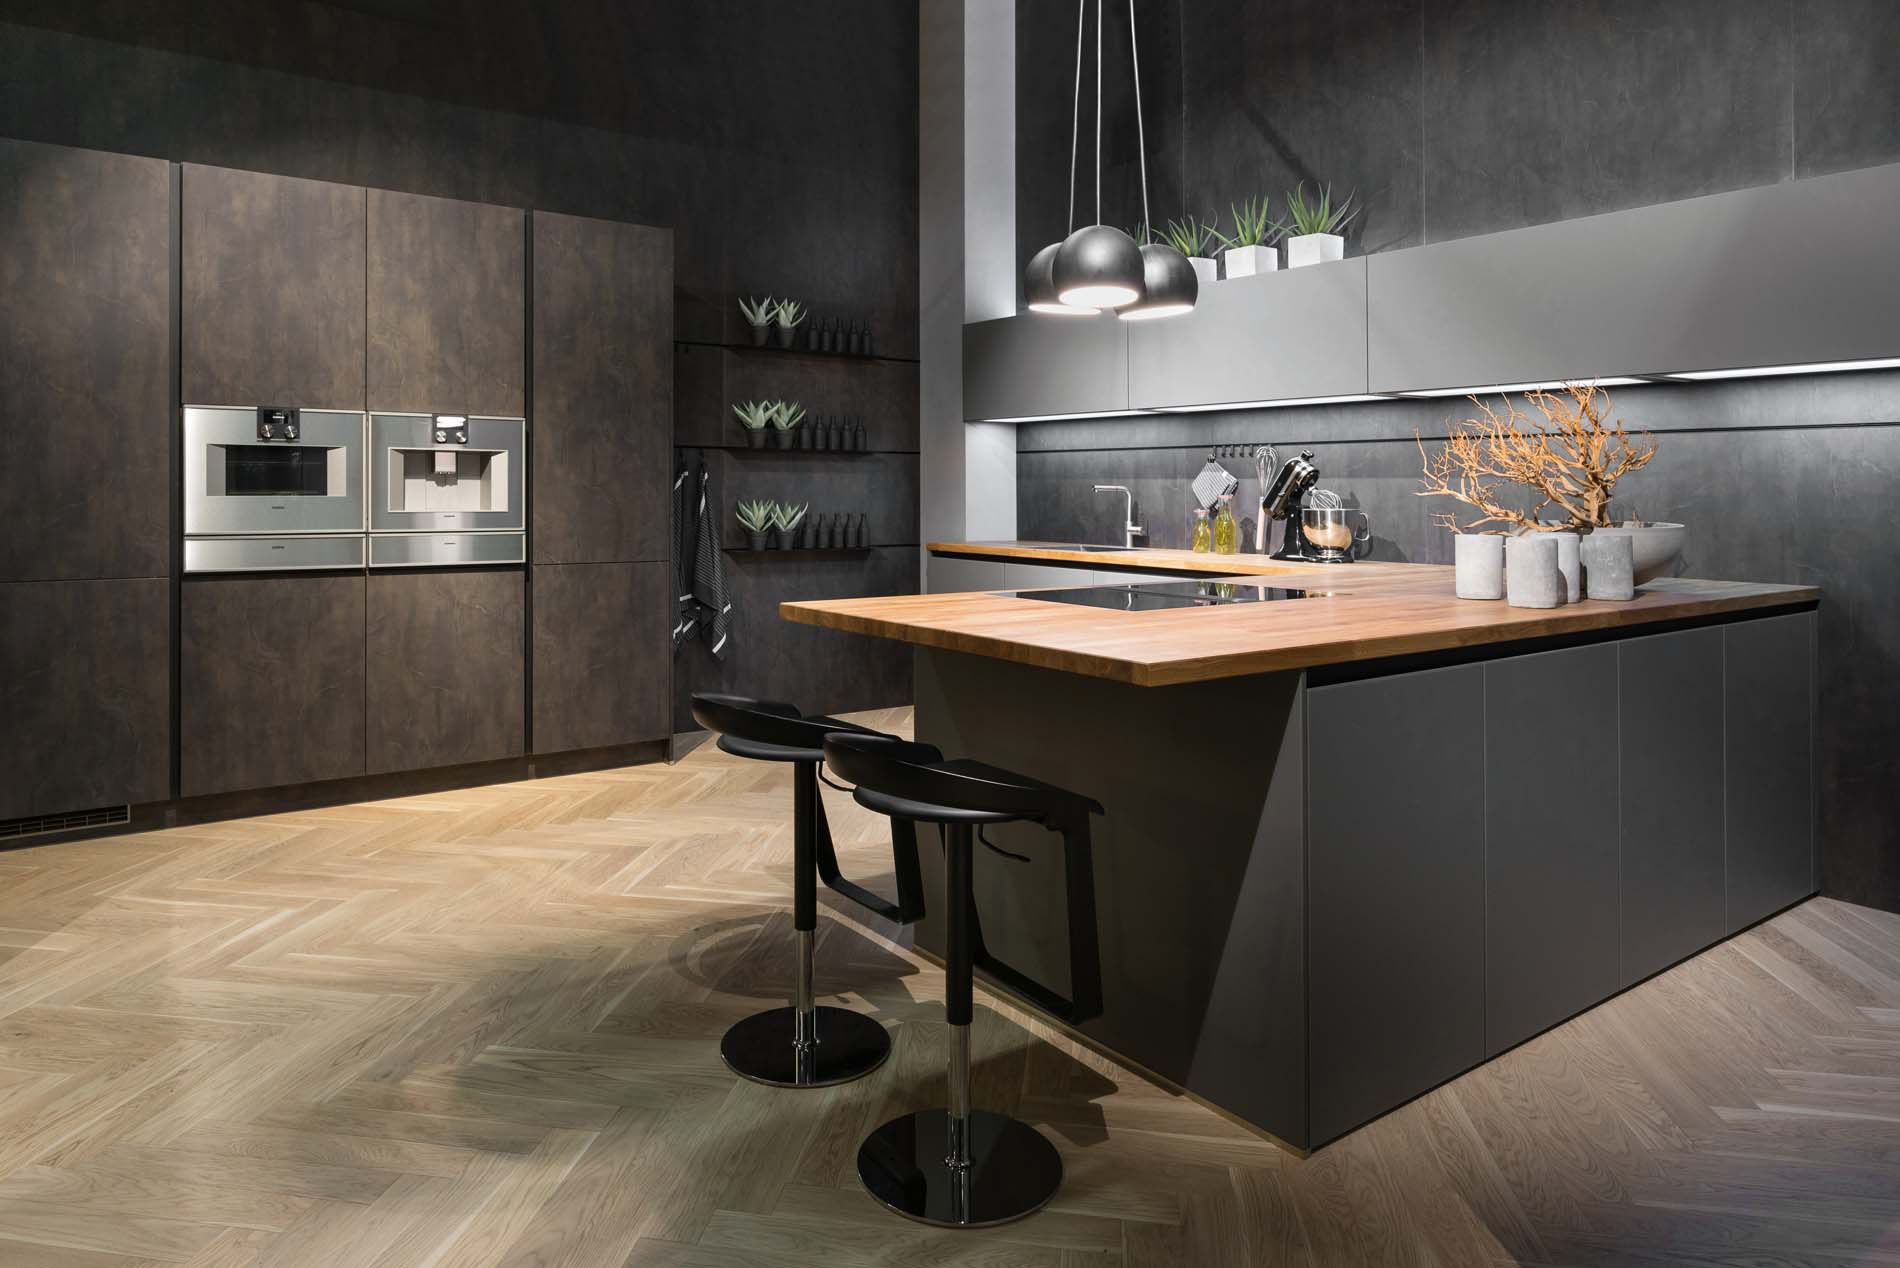 Keukens Met Kookeiland : Keuken inpiratie kookeiland nieuwe keuken kopen? aswa keukens